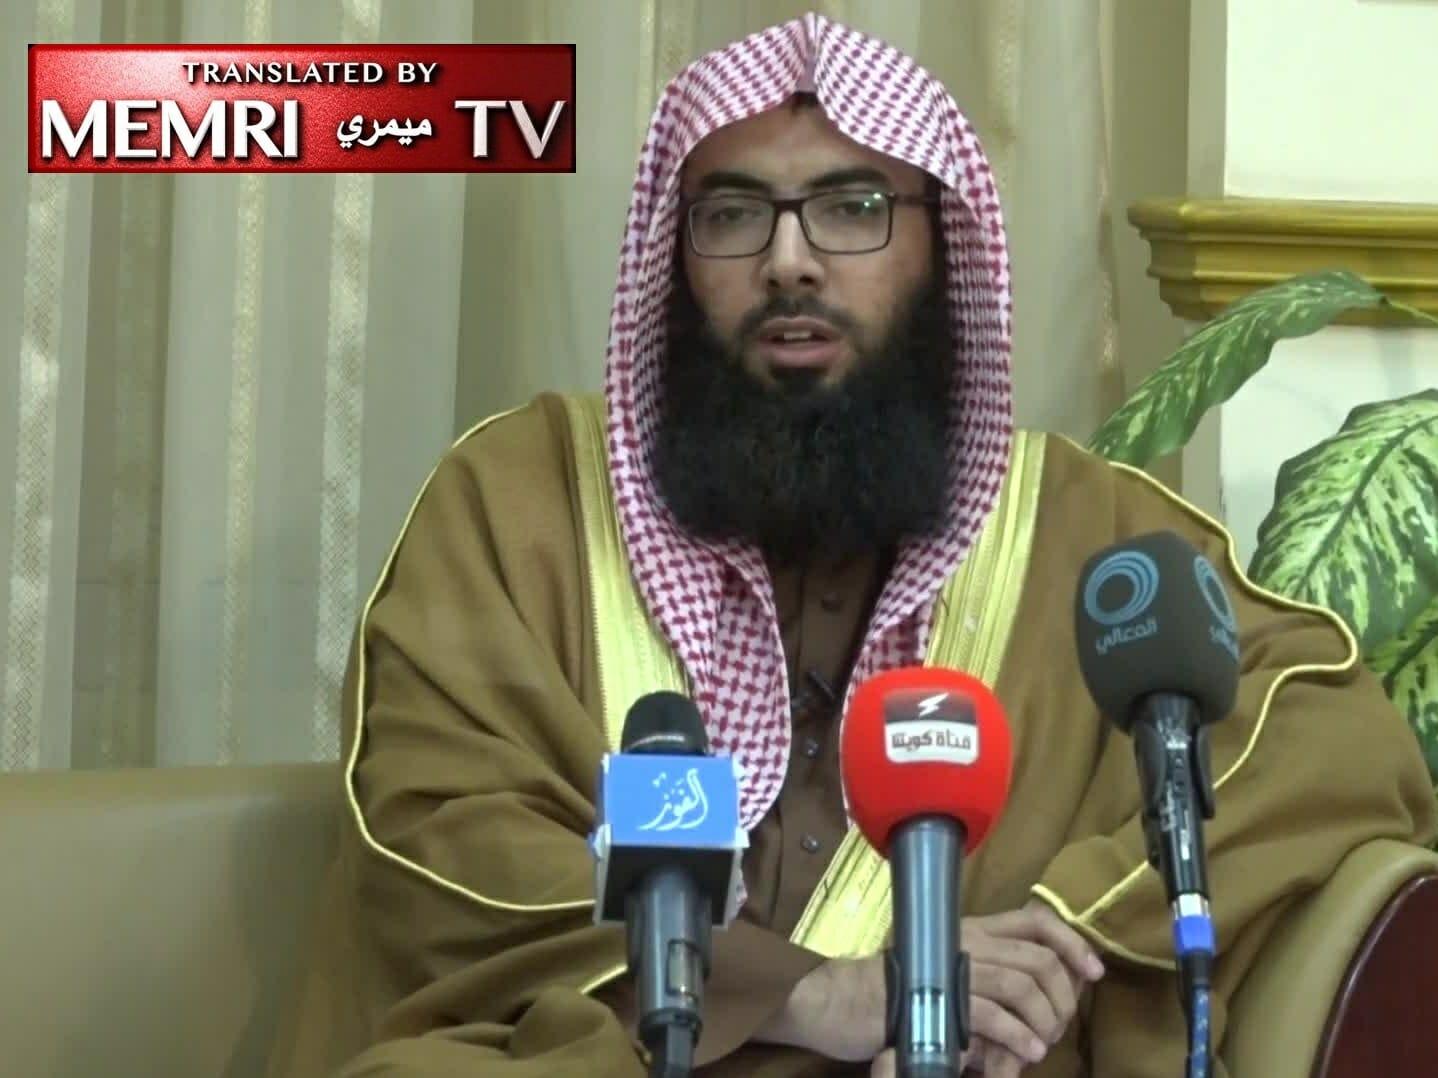 https://www.mena-watch.com/wp-content/uploads/2019/01/Sheikh_Al-Tubasi.jpg